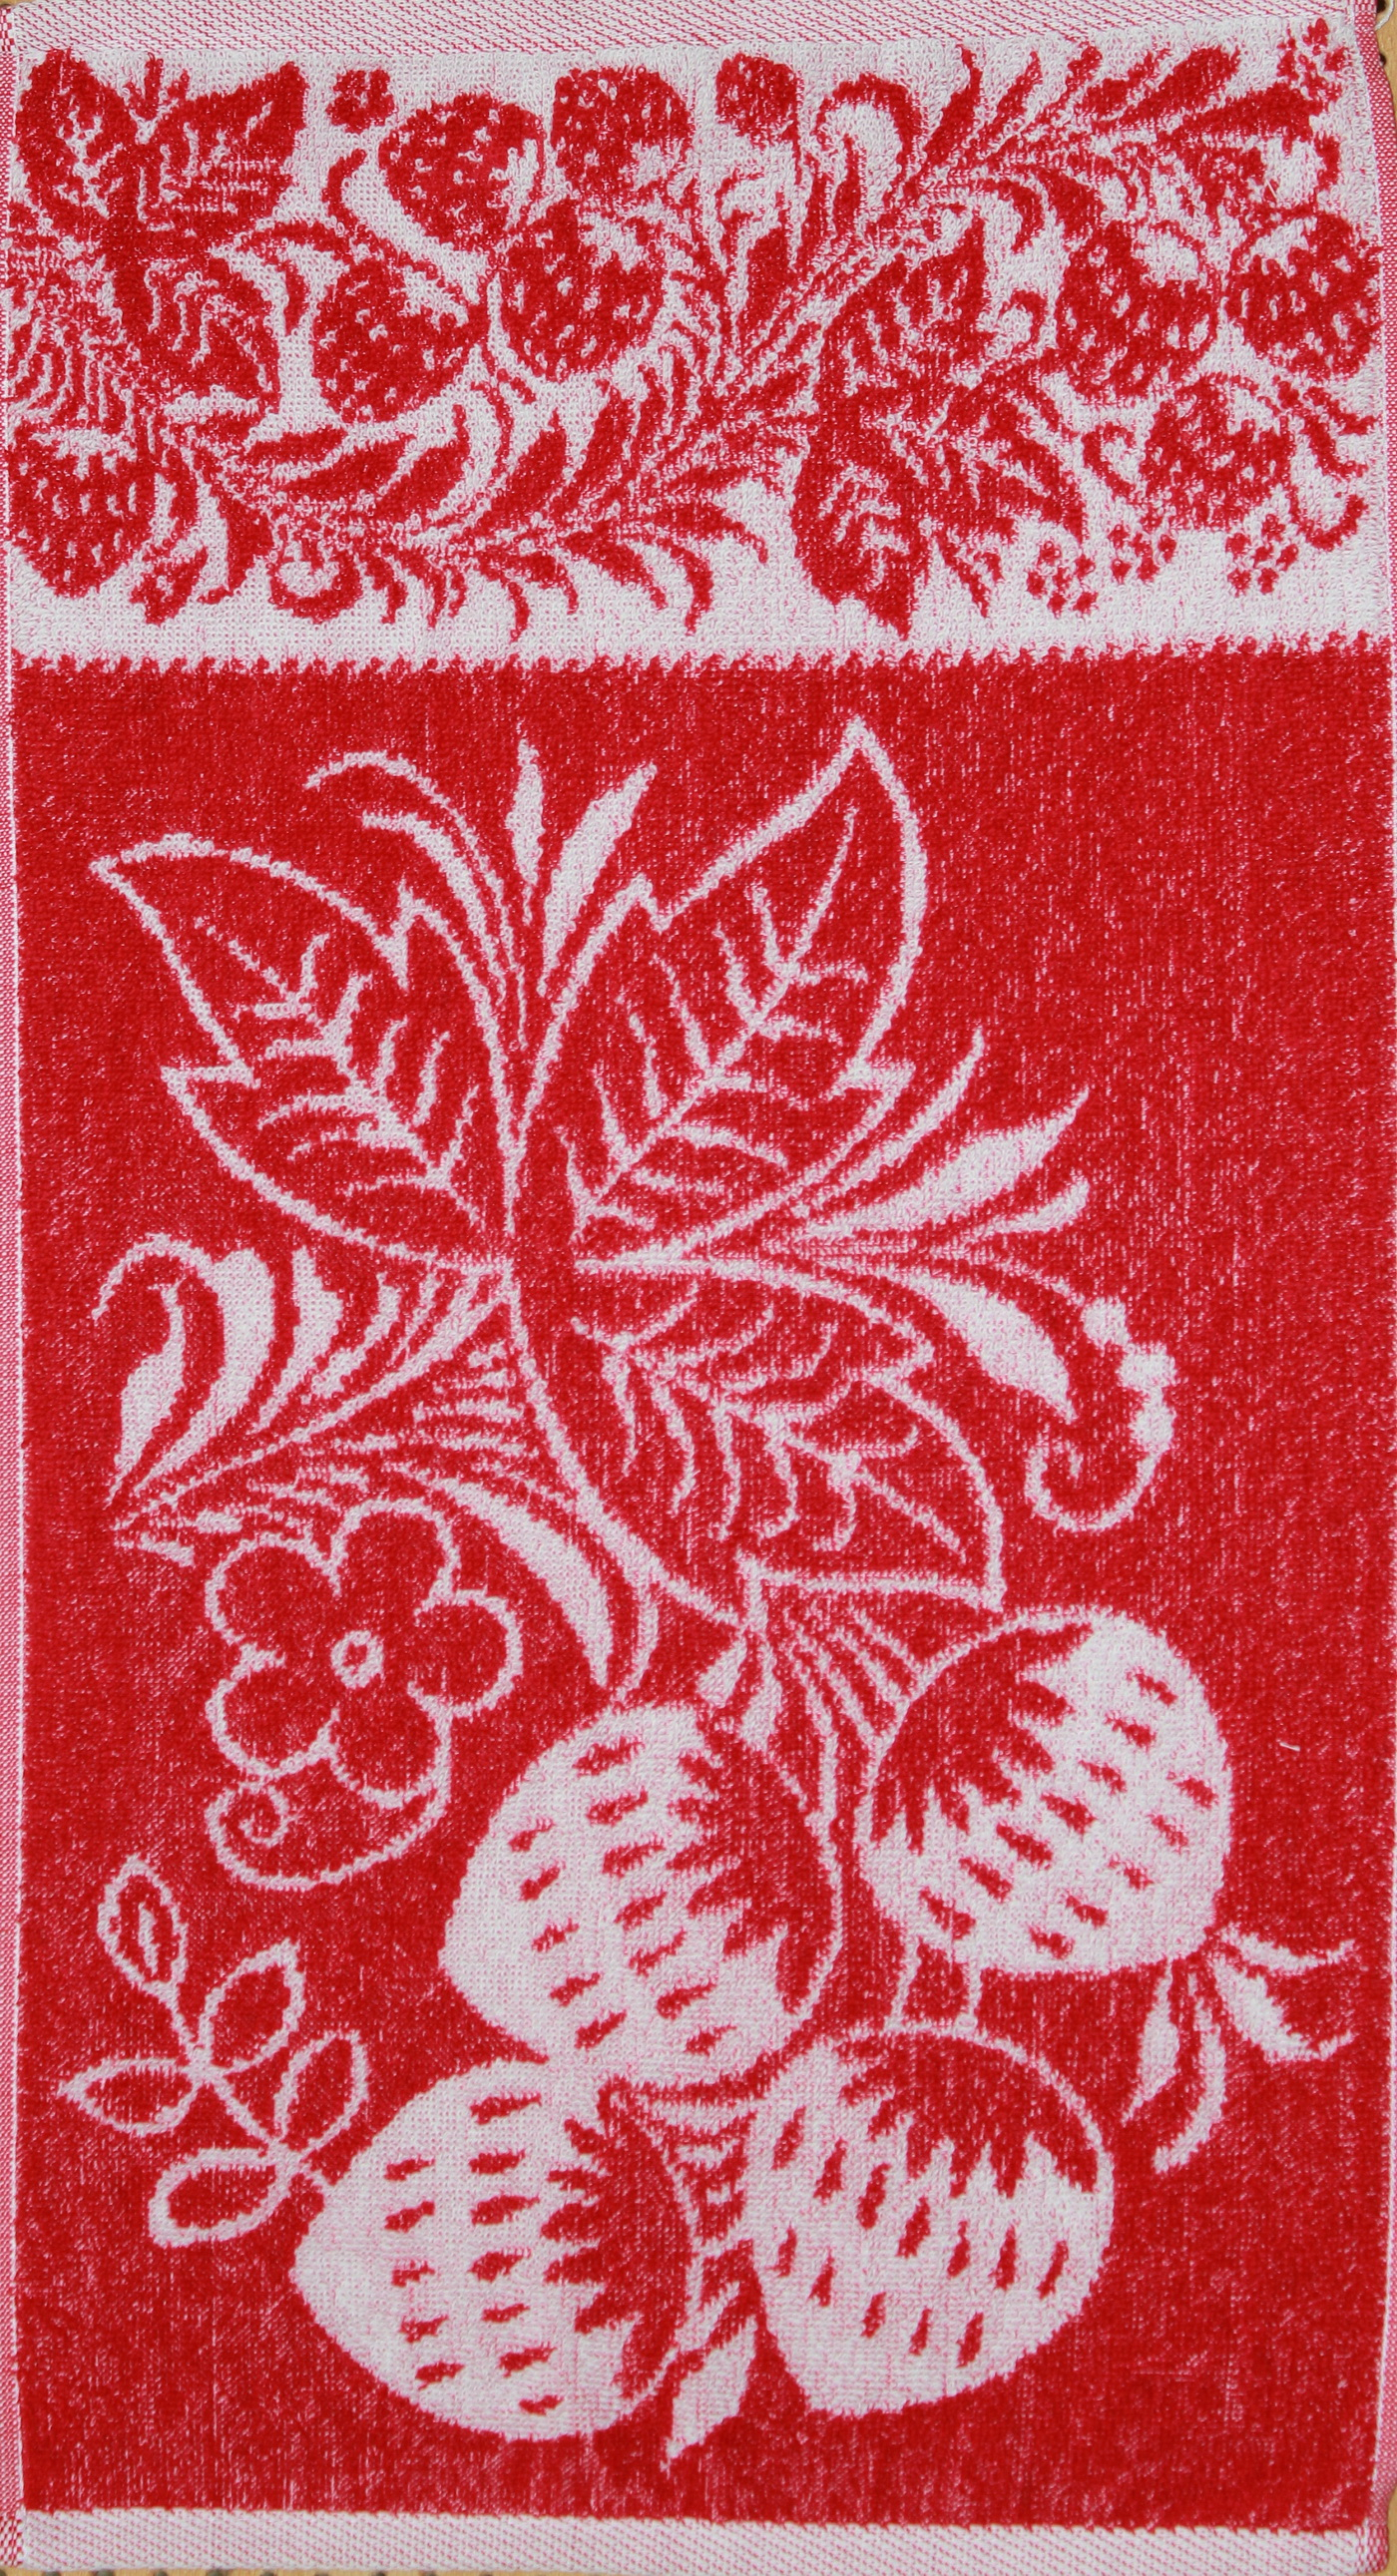 Полотенце махровое Клубника 30х60Полотенца<br><br><br>Размер: Красный